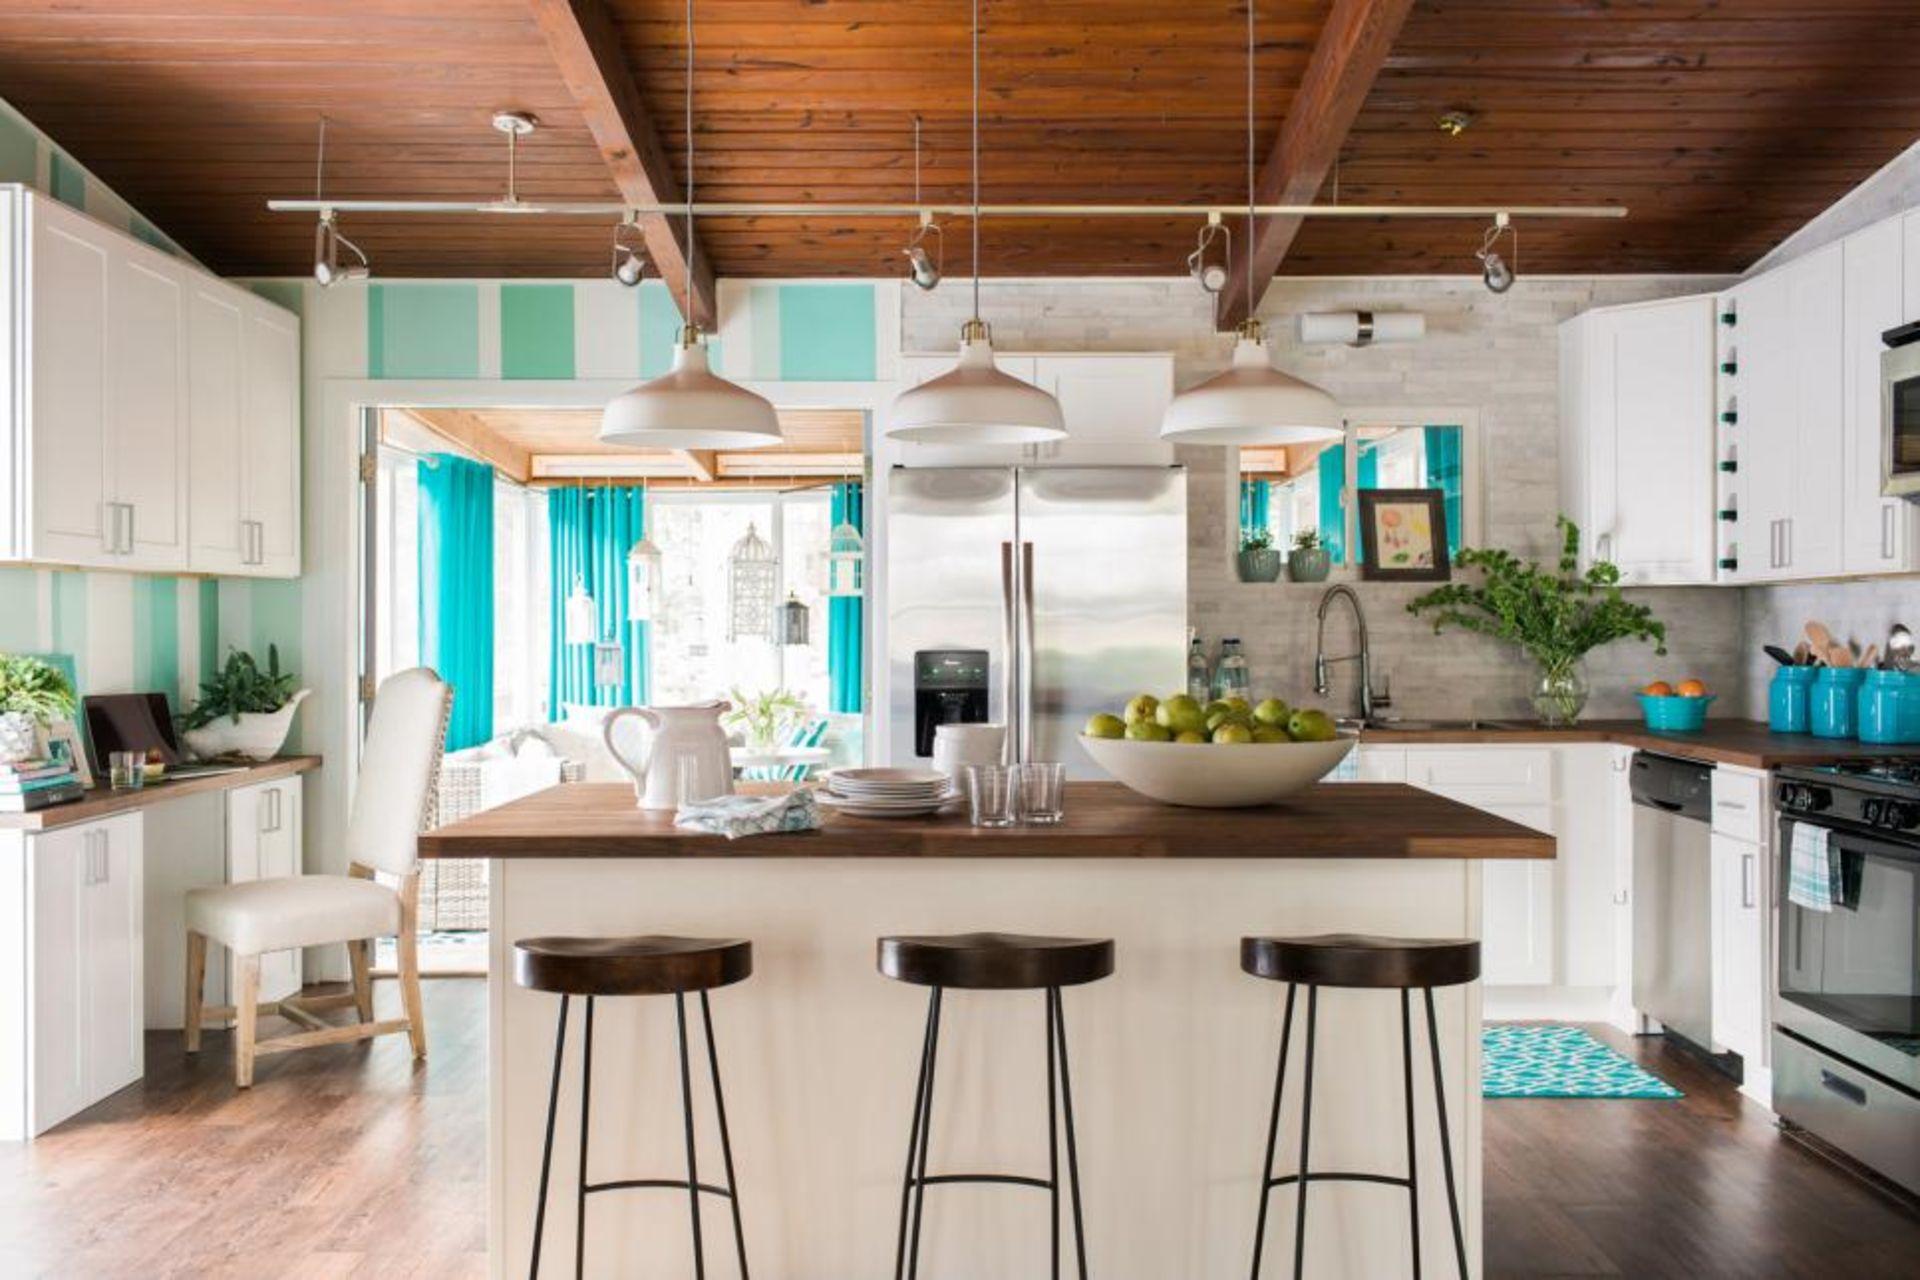 19 Budget Friendly Kitchen Remodel Ideas